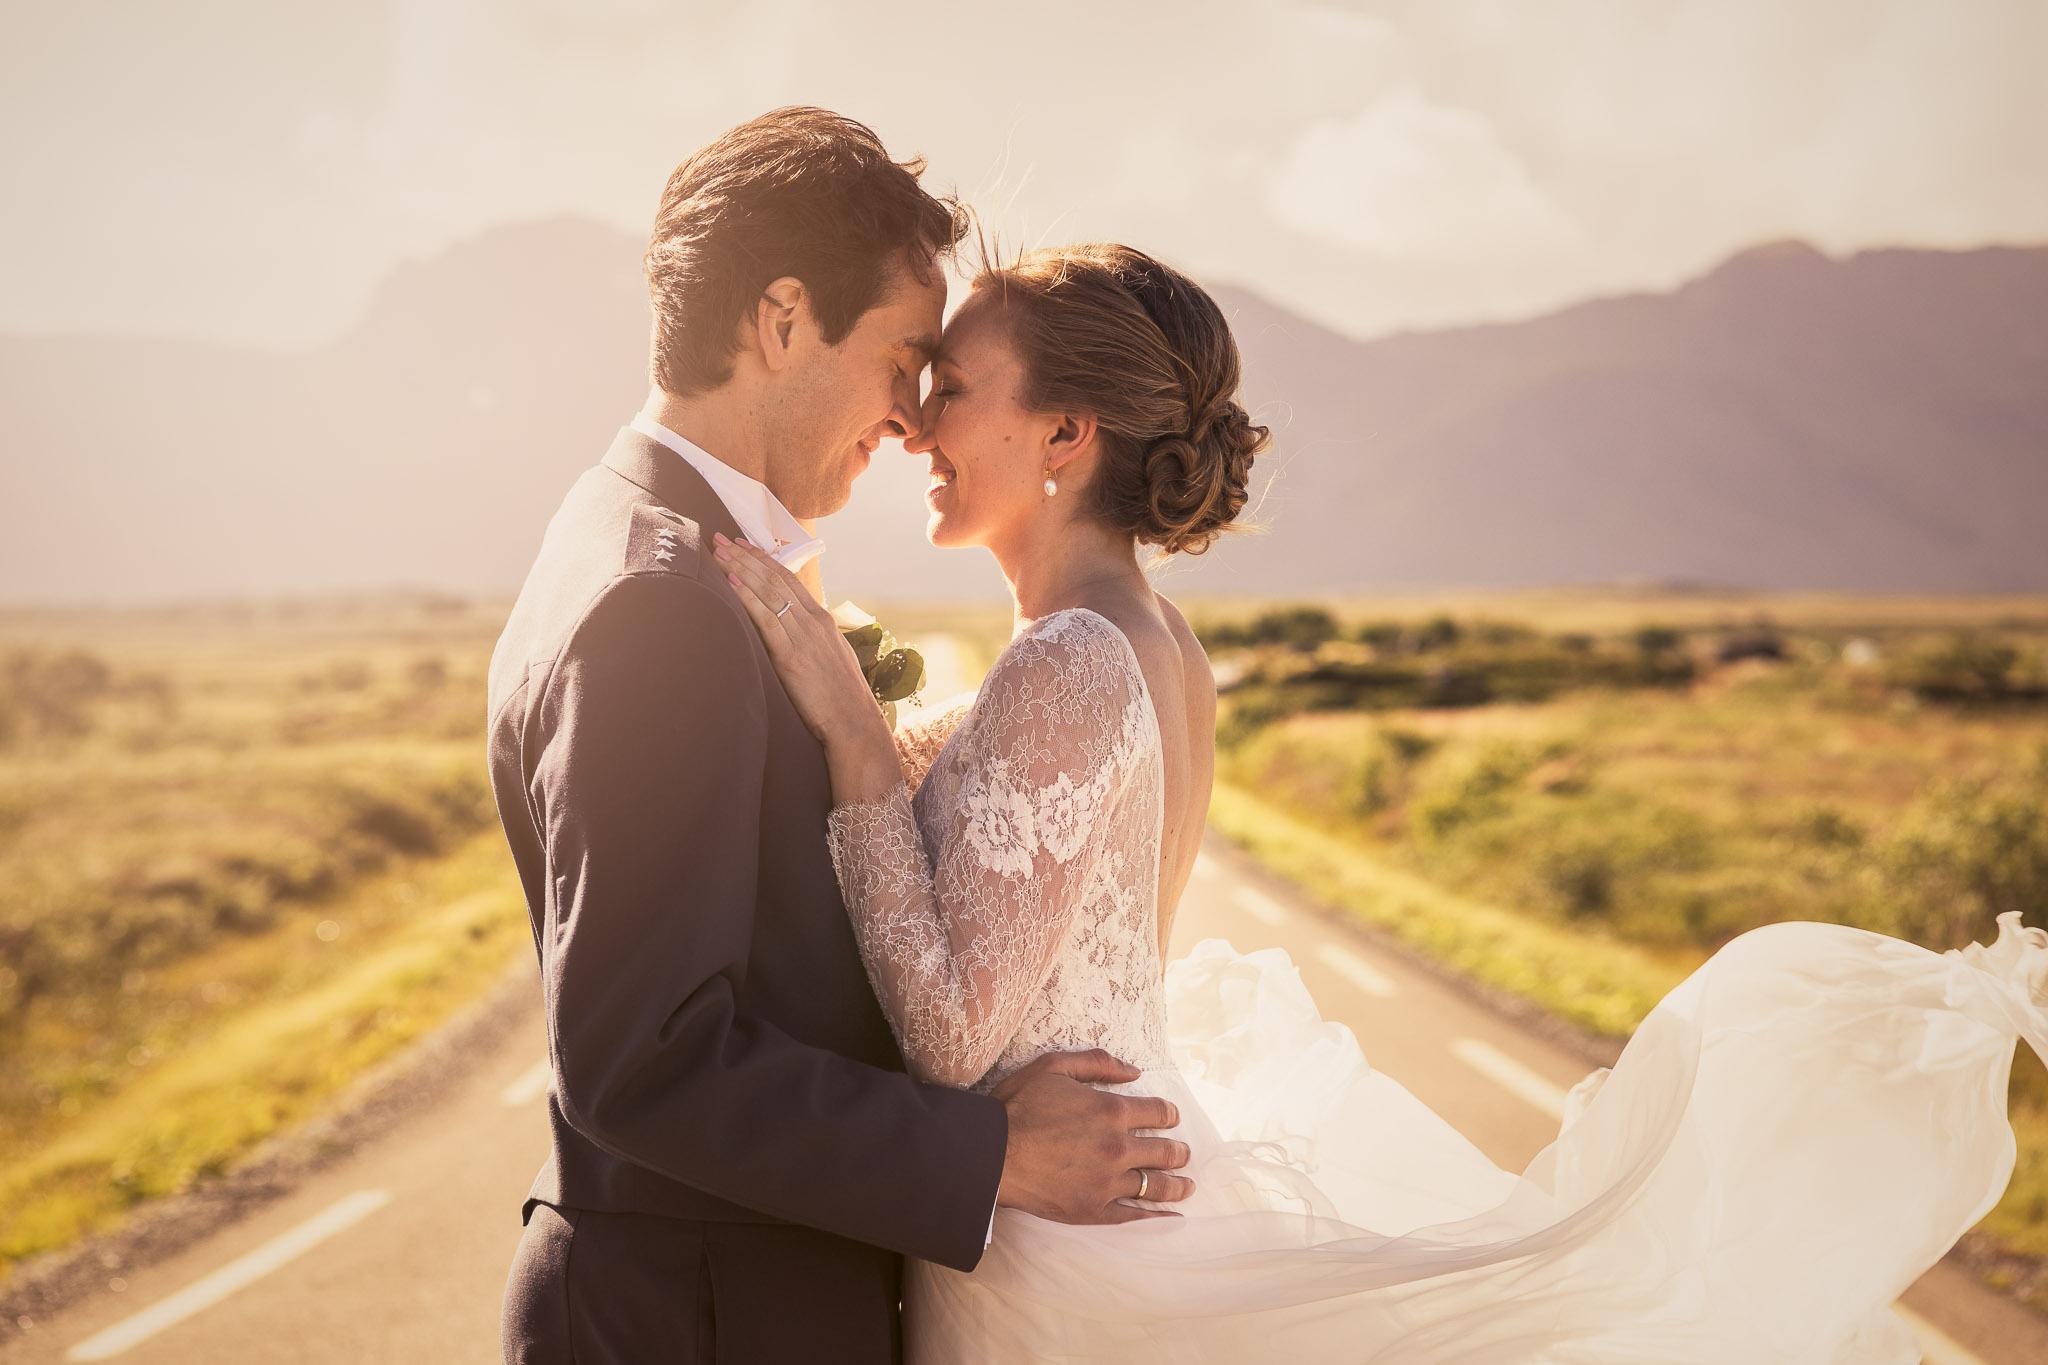 Bryllupsfotografering-lofoten-heldags-fjell-5